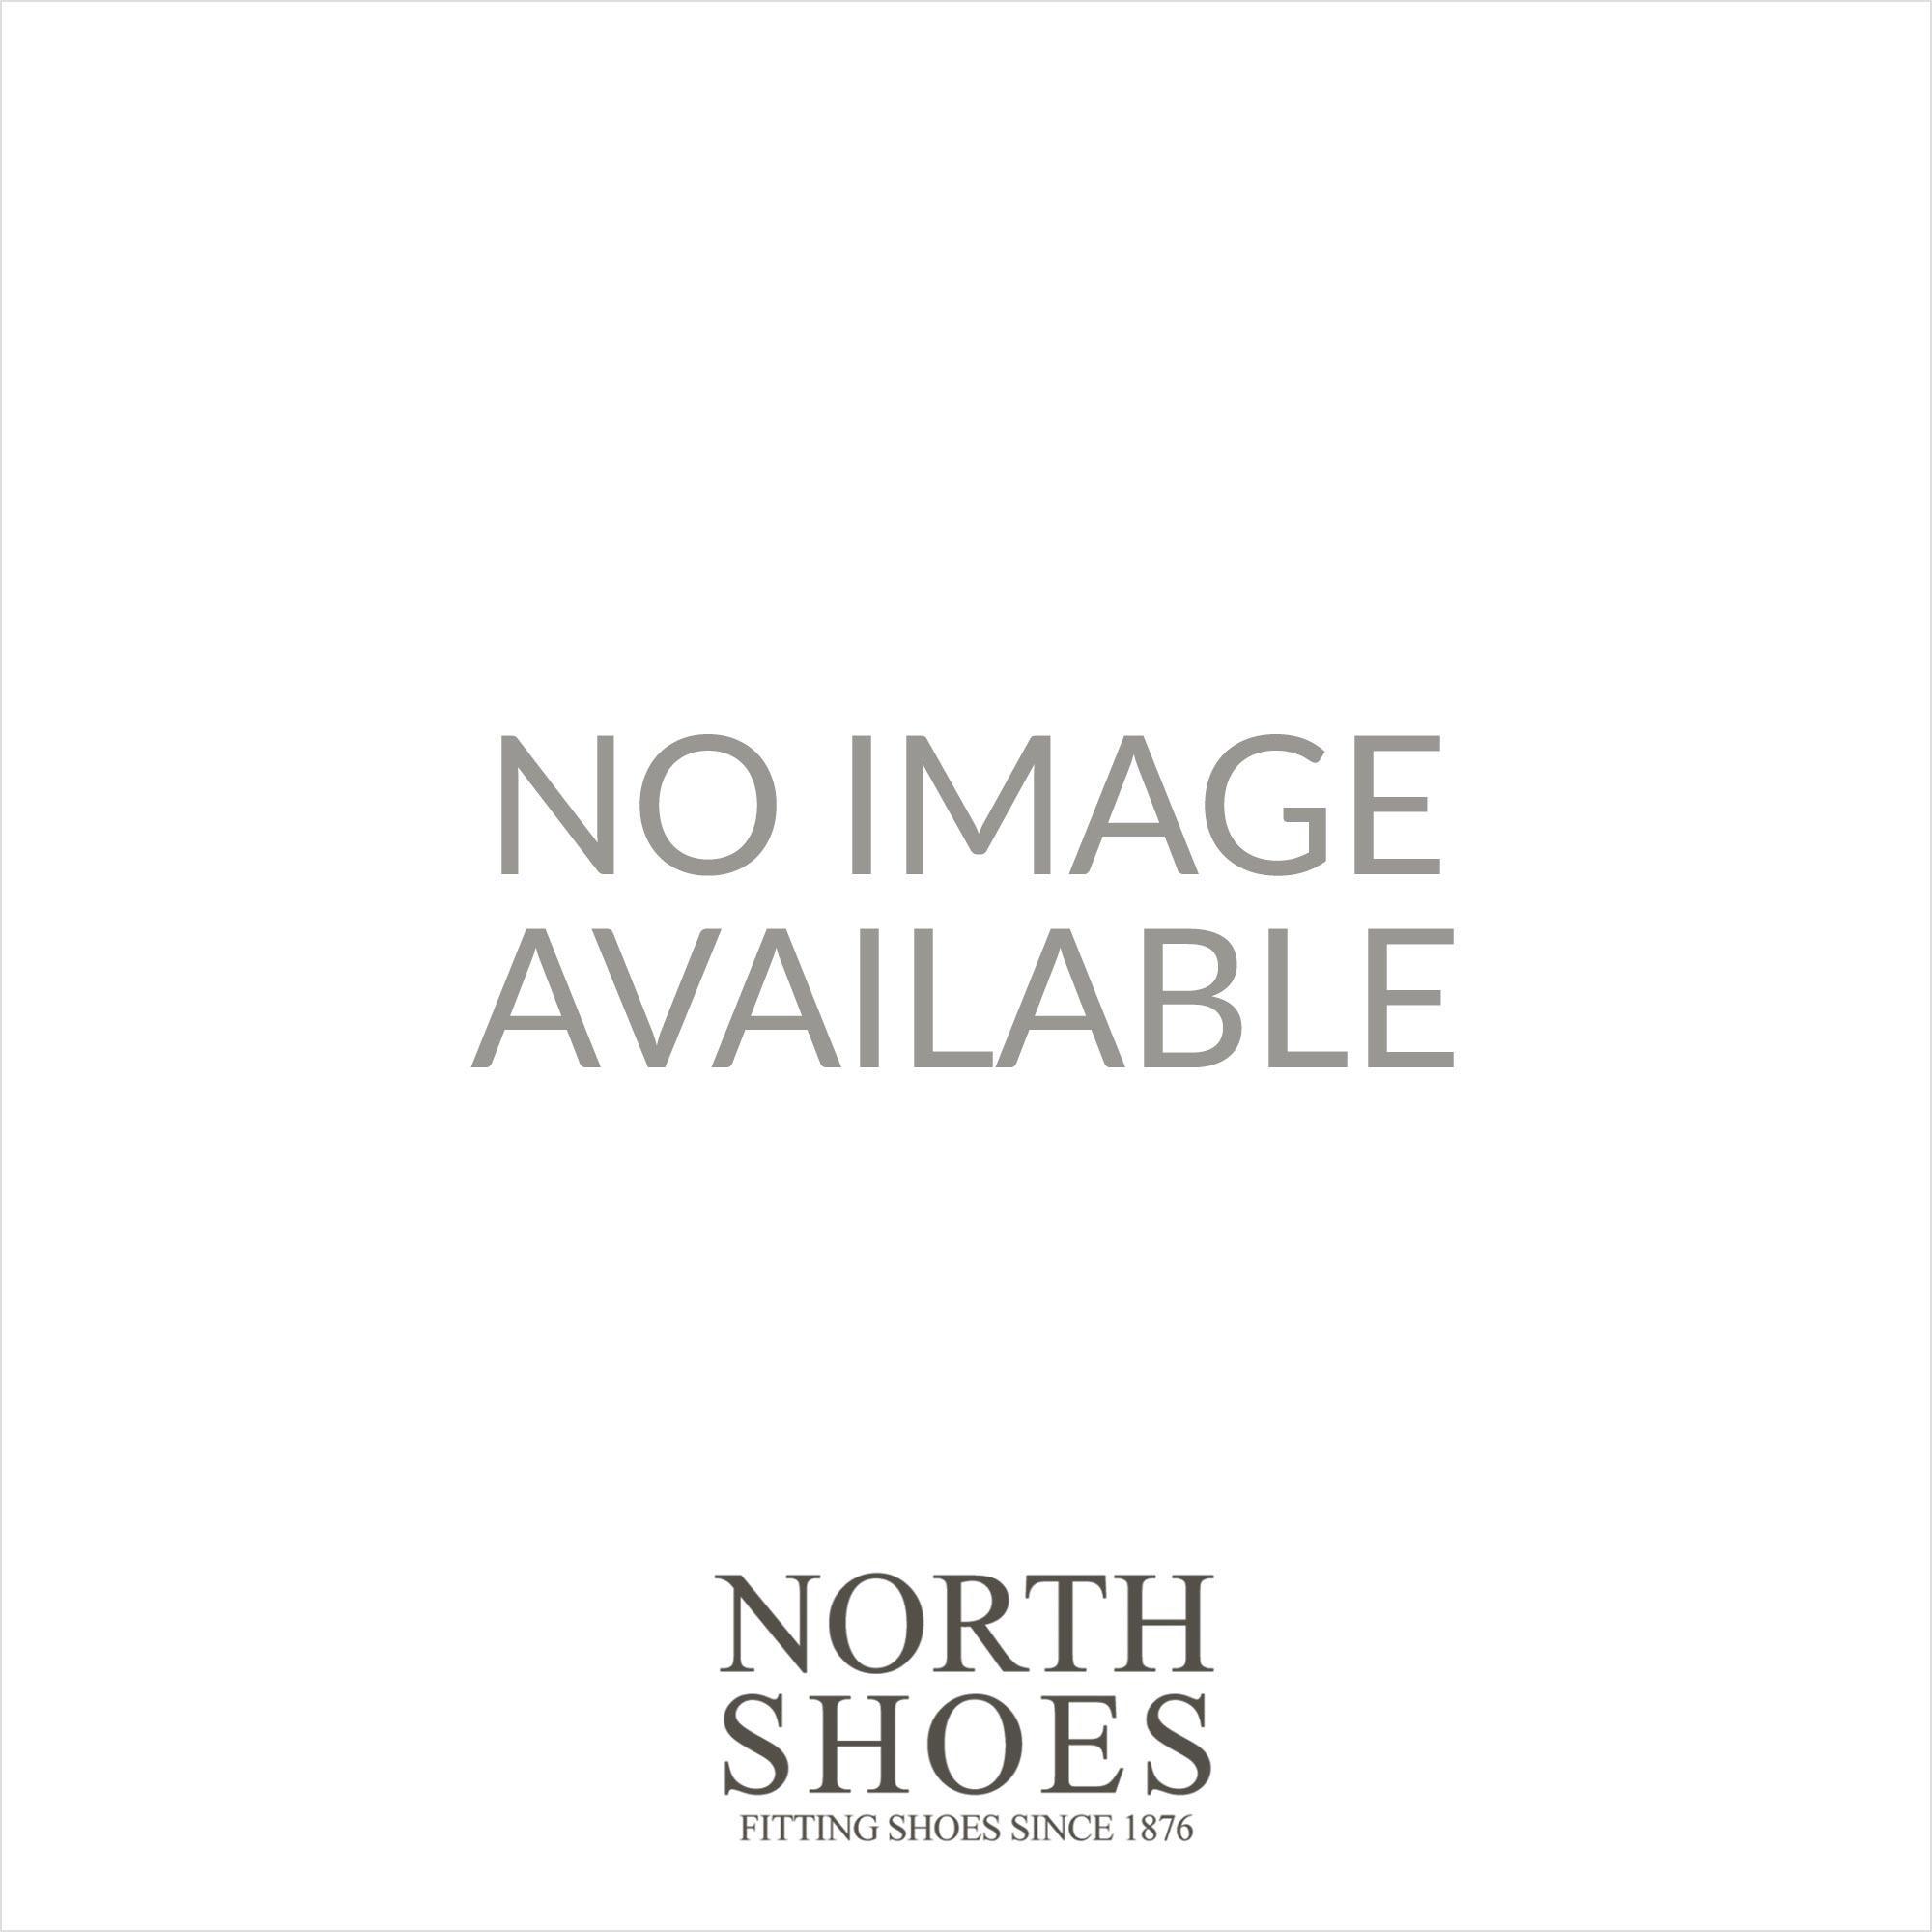 77b706f9039 Tamaris 25310 Olive Leather Womens Zip Up Chelsea Boots - Tamaris ...